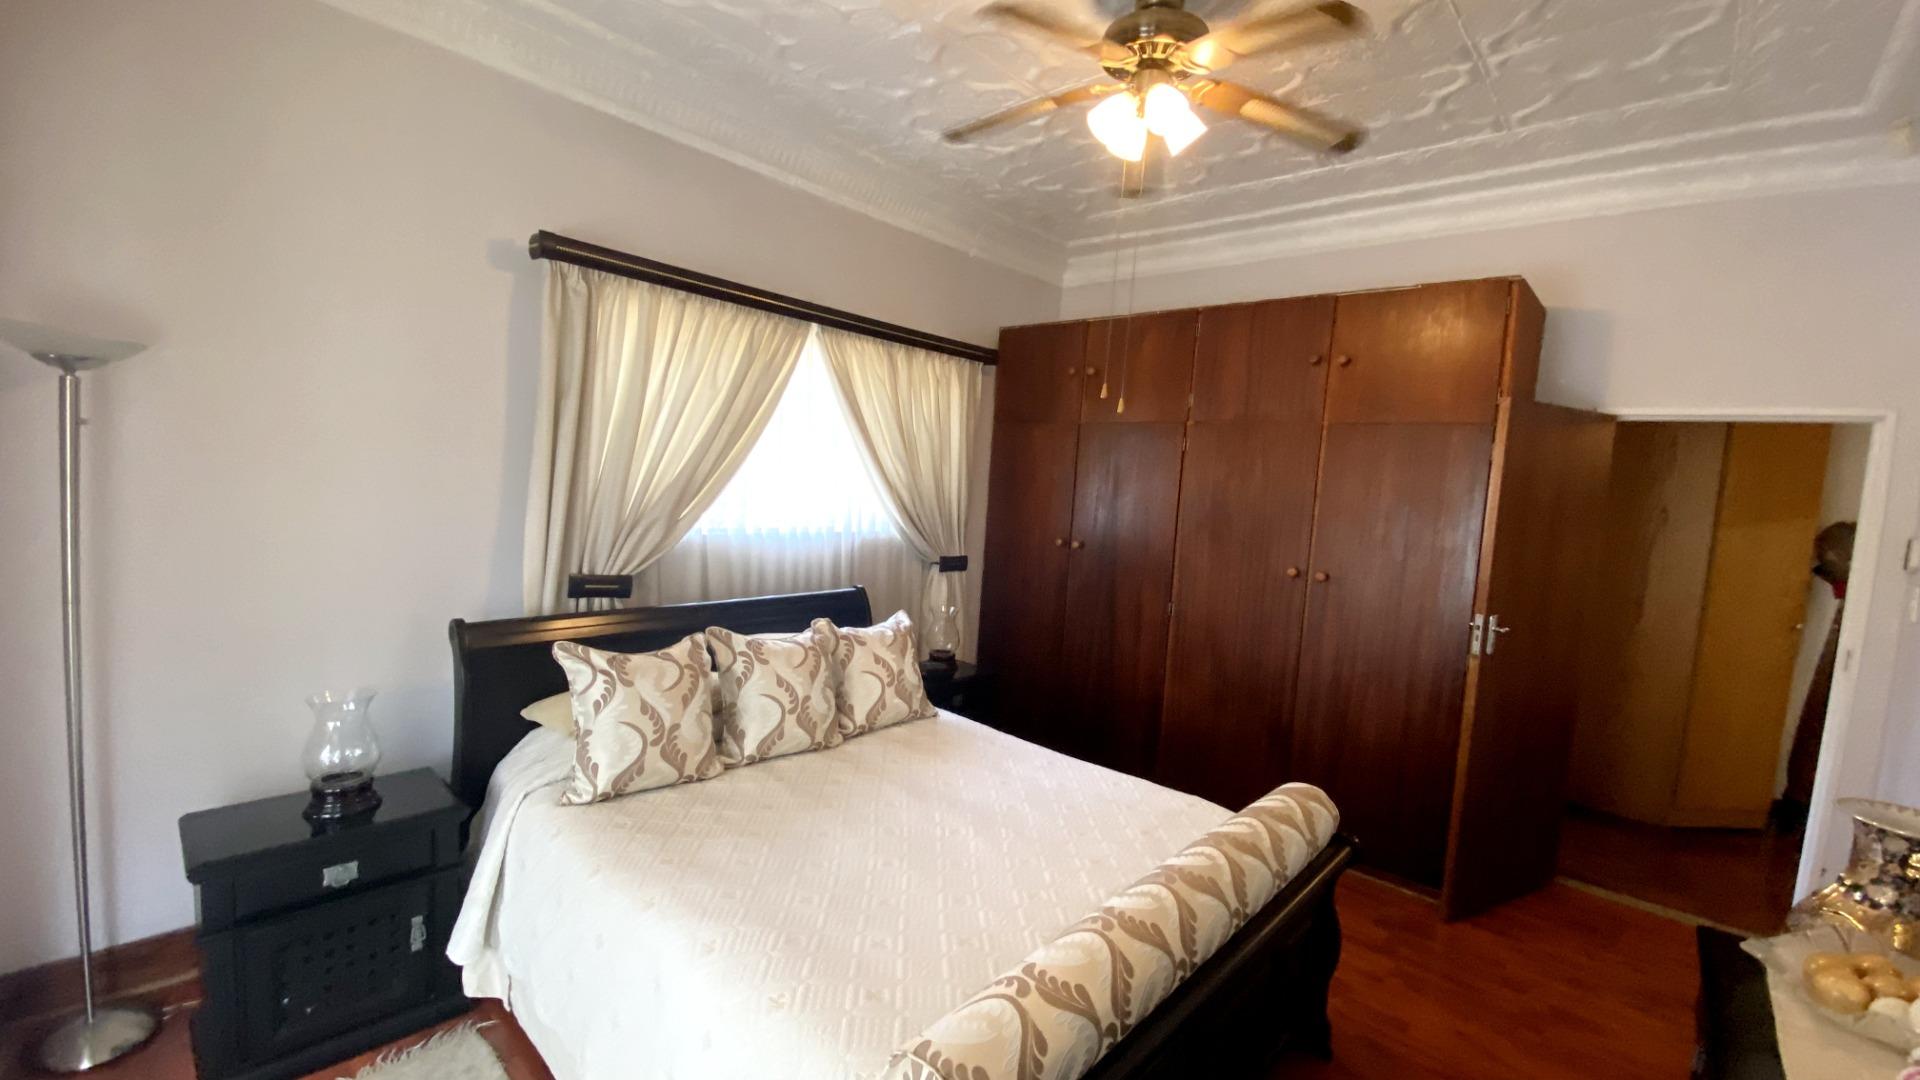 3 Bedroom House For Sale in Brakpan Central